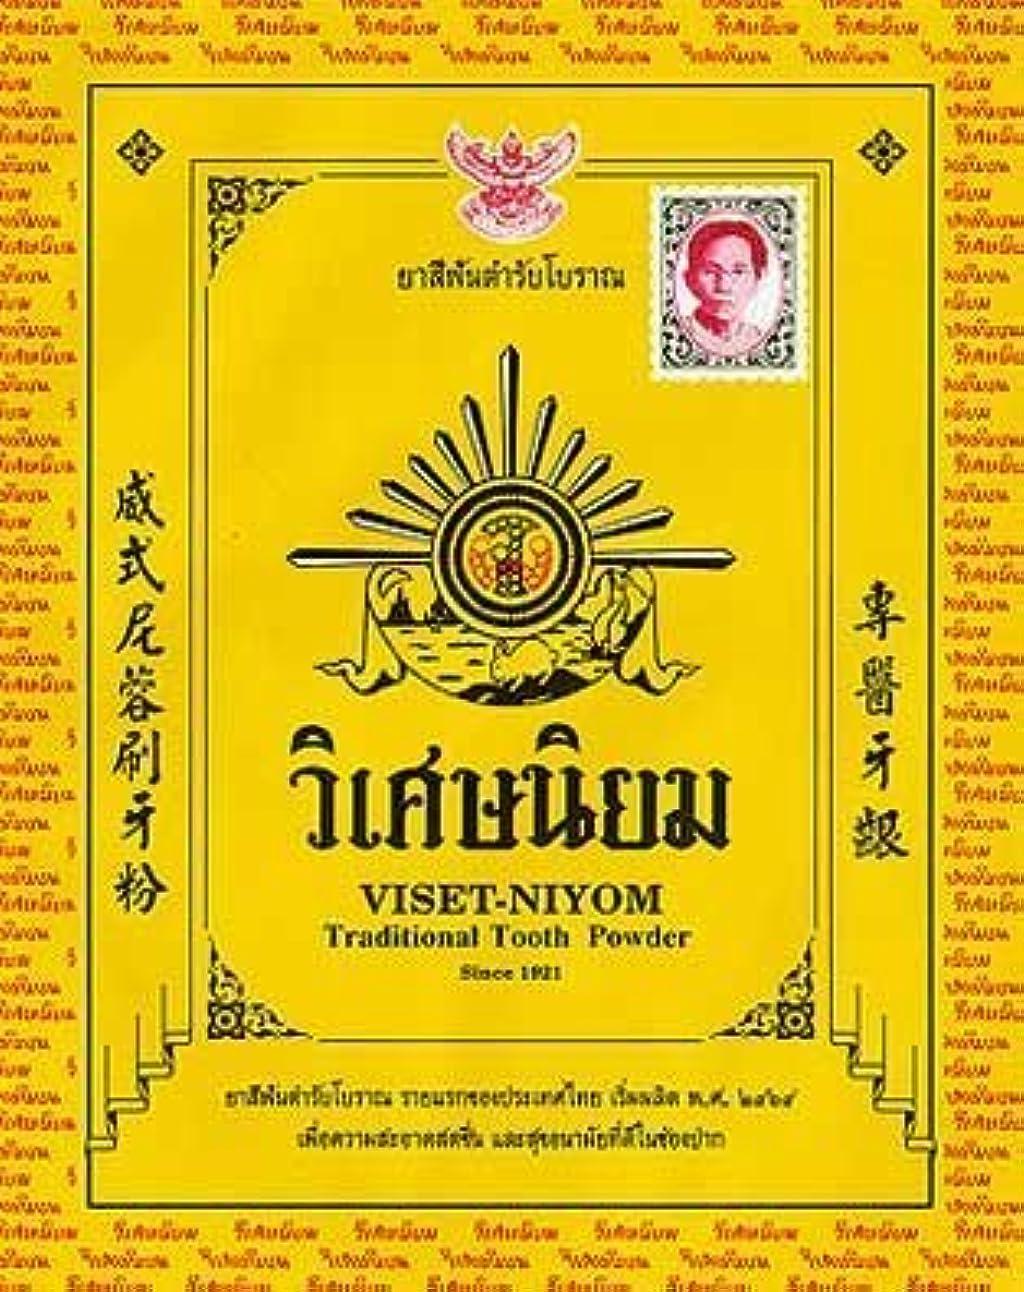 3 Sachets X 40g. of Viset Niyom Herbal whitening Toothpaste Powder Thai Original Traditional Toothpaste 120 g....